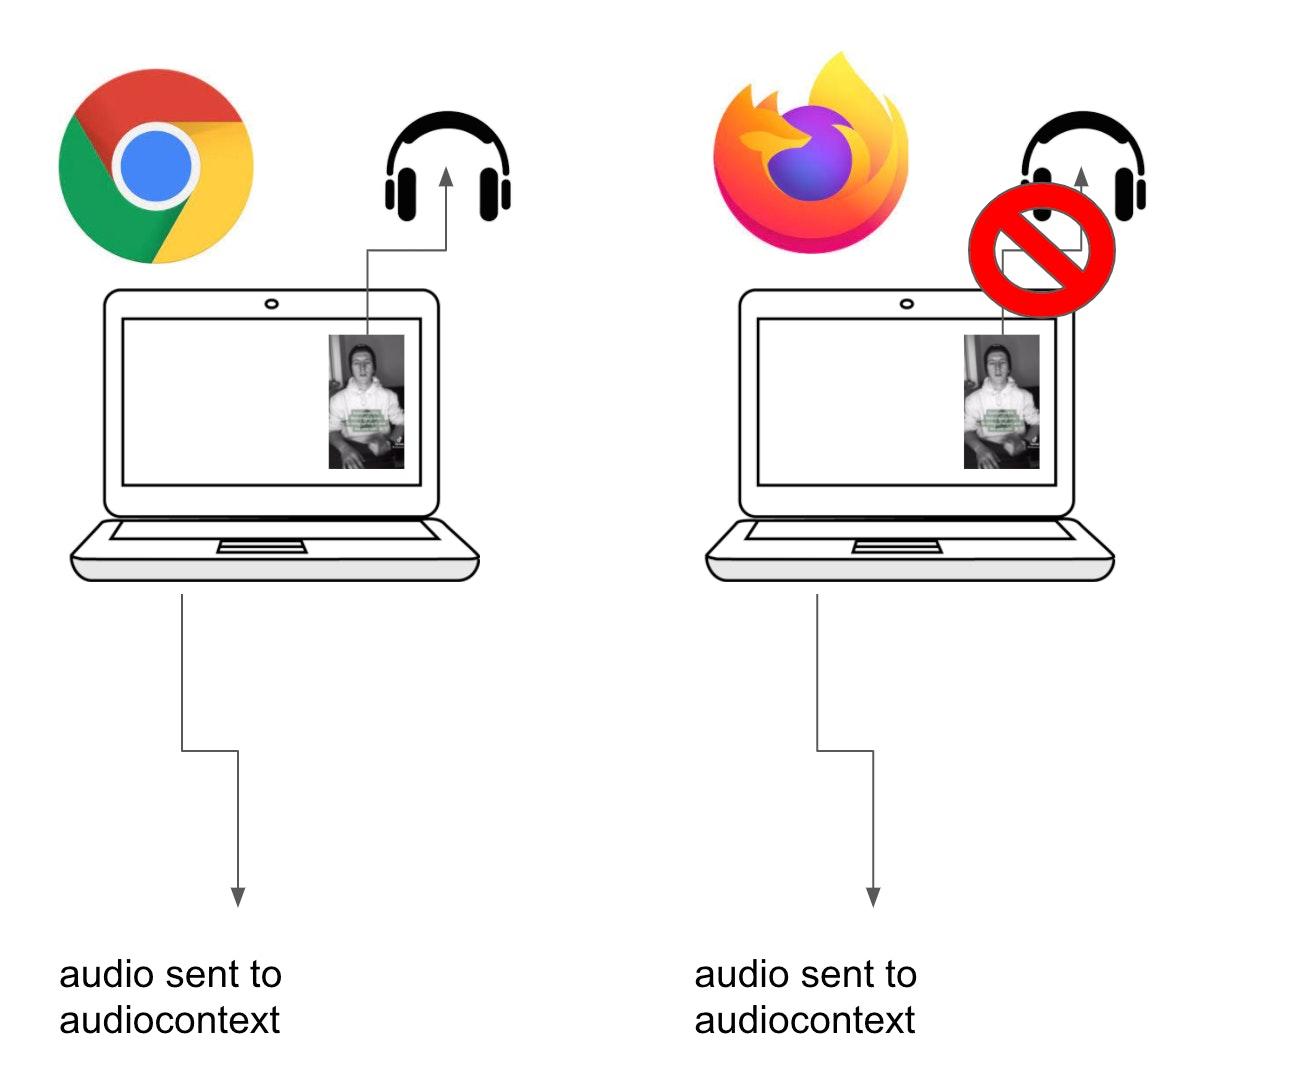 audio context schematic